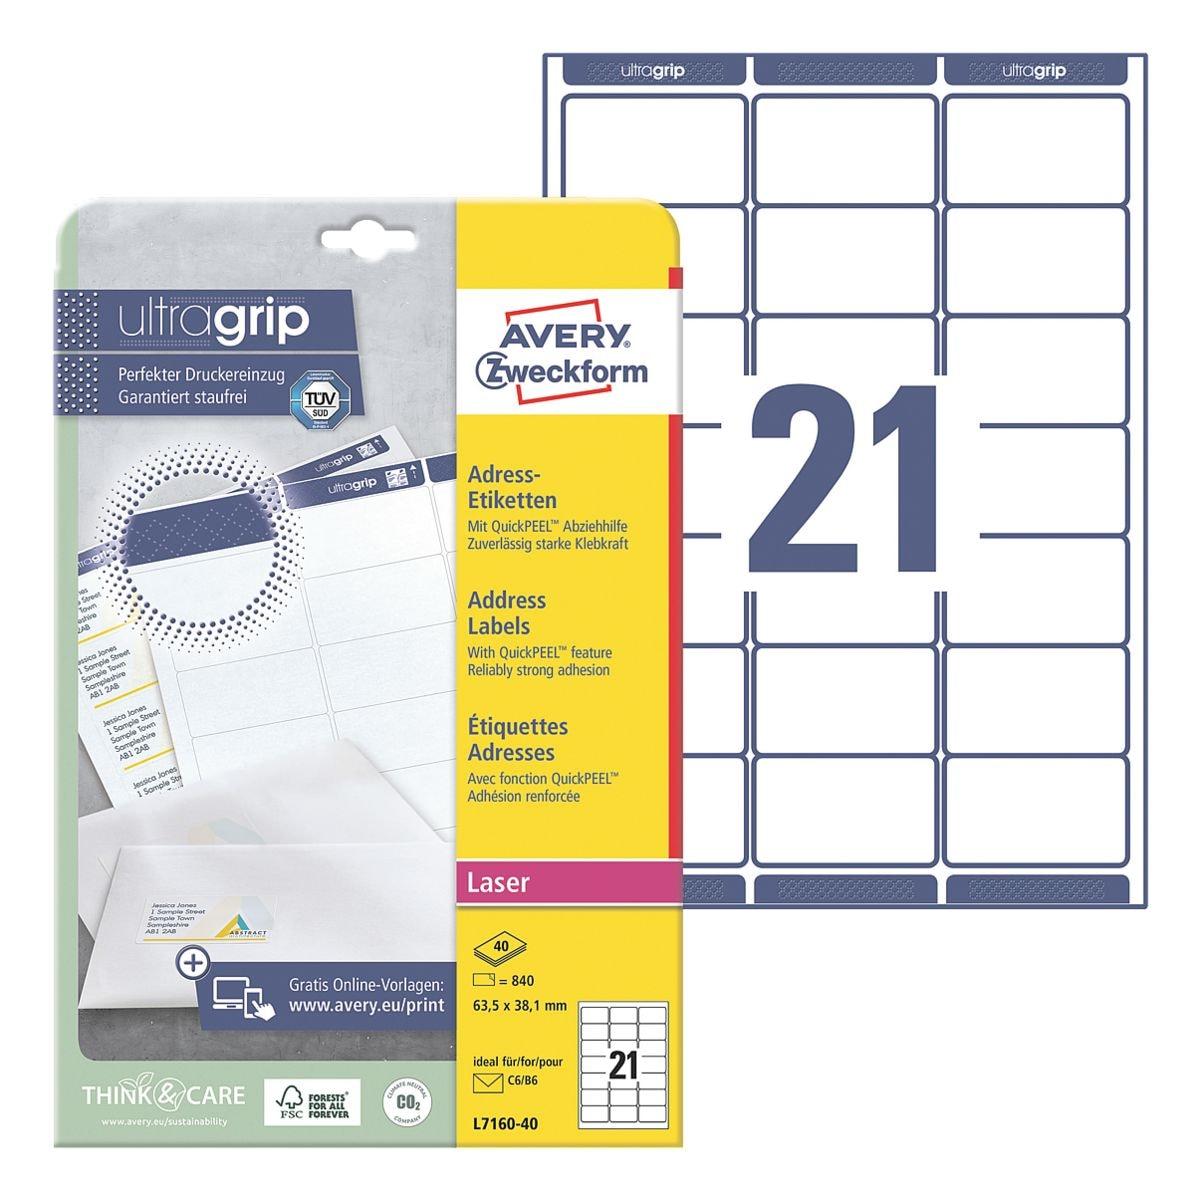 Avery Zweckform 840er-Pack Adress-Etiketten mit ultragrip »L7160-40«